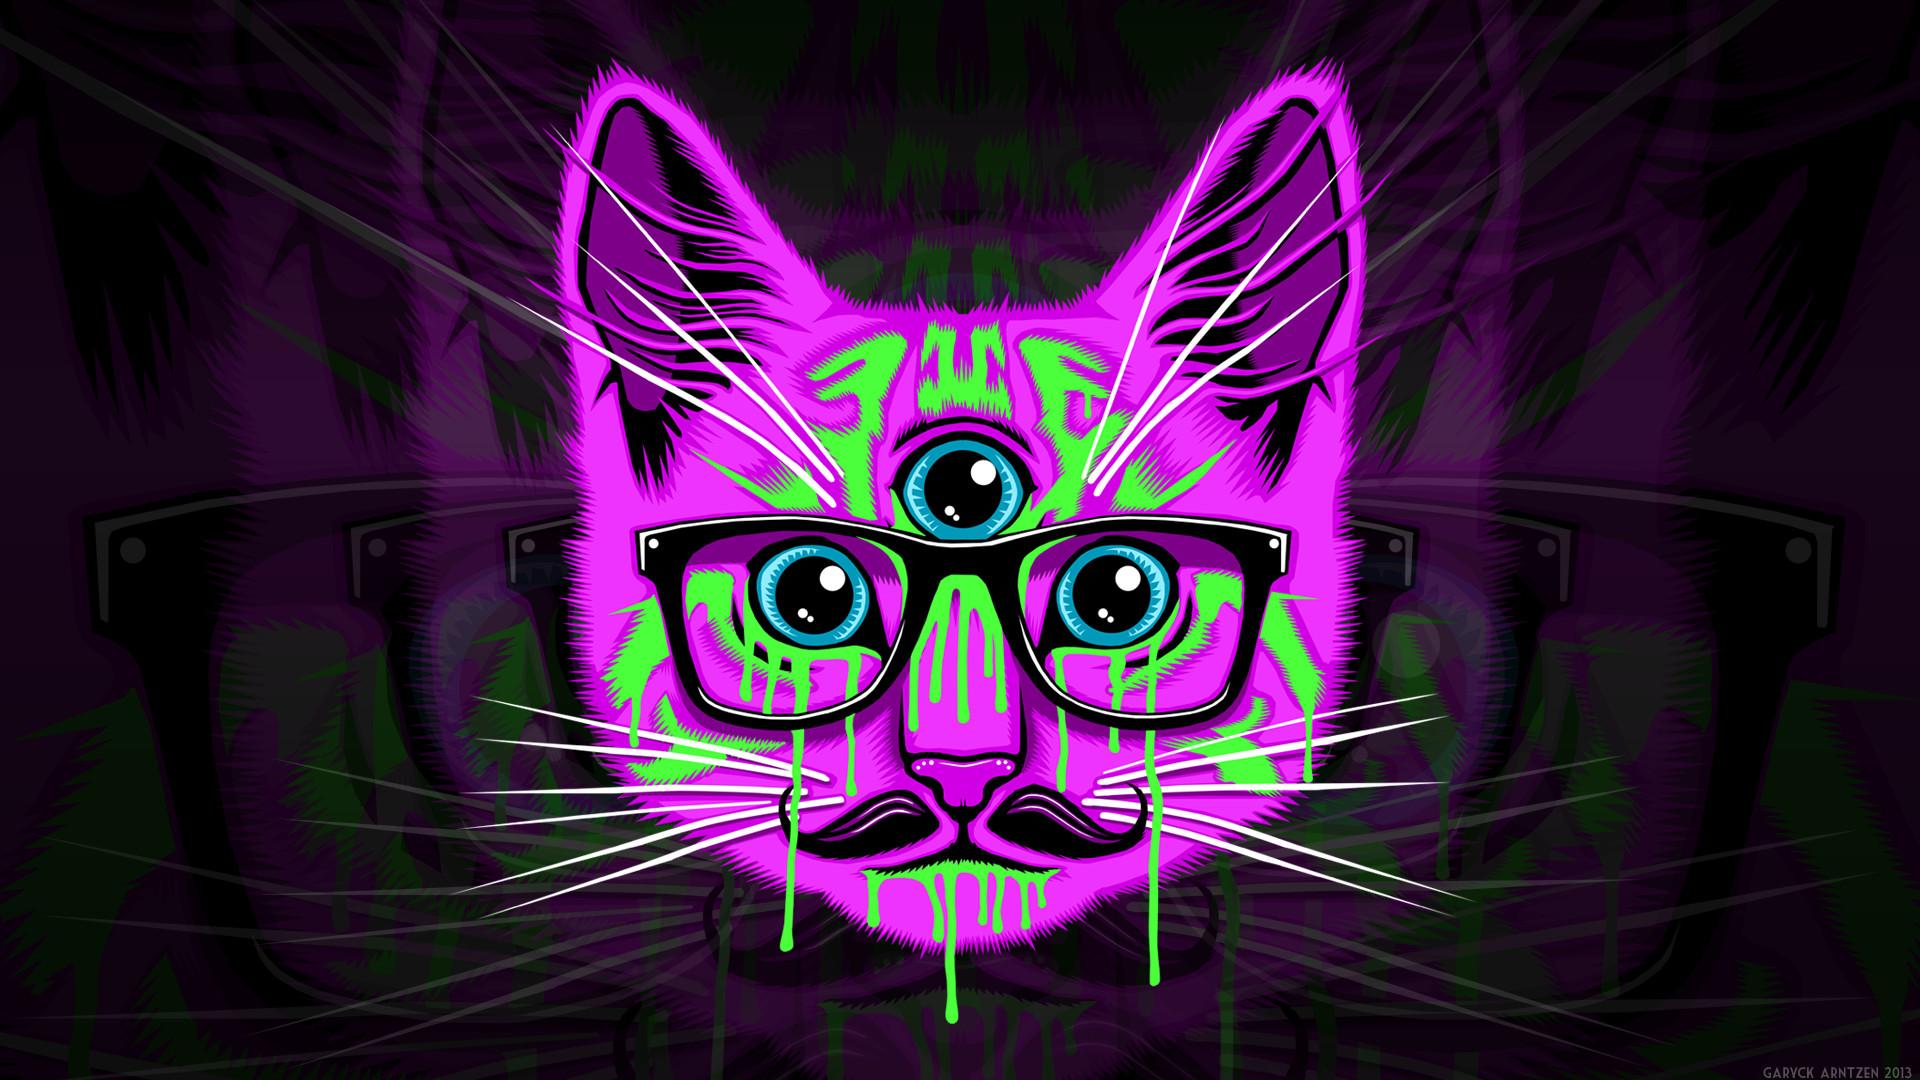 Meow Illuminati Wallpaper HD.